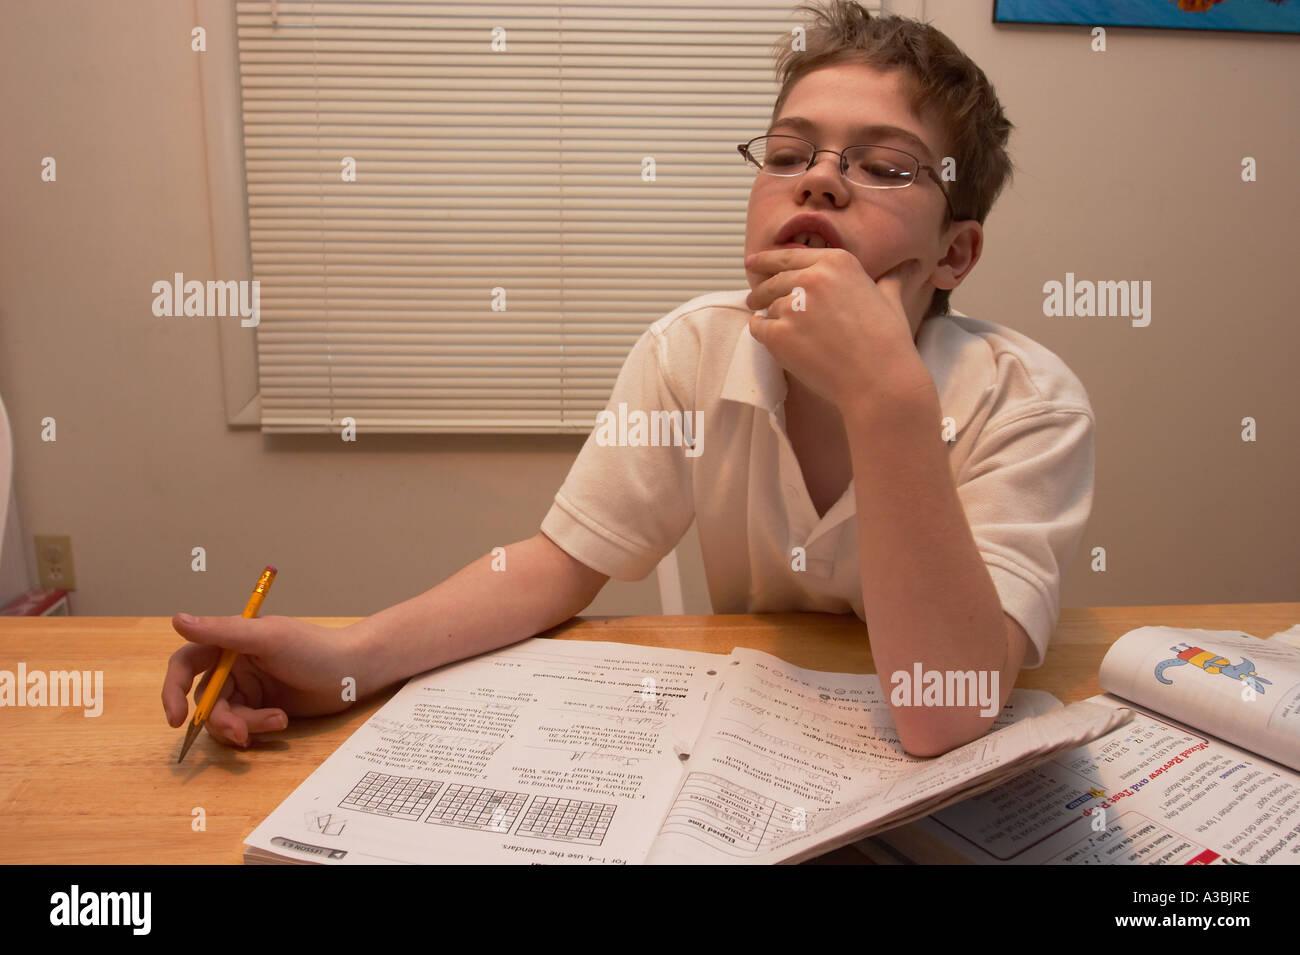 Teen Boy Doing Homework Stock Photos  Royalty Free Images